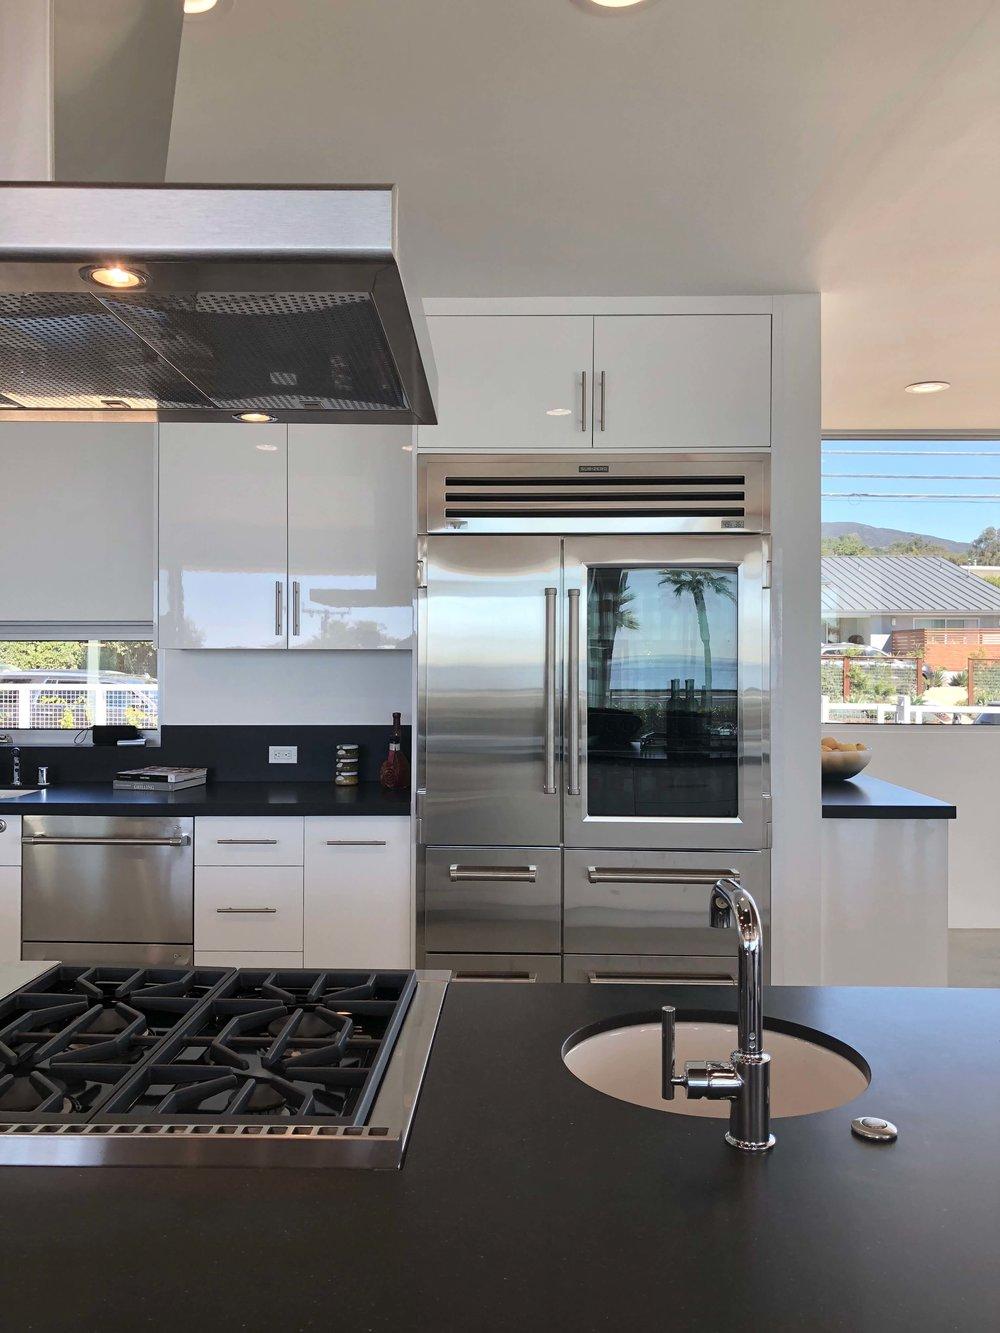 California contemporary design - Dwell on Design's Fall Home Tour, Designer: Vitus Mitare #contemporaryarchitecture #kitchendesignideas